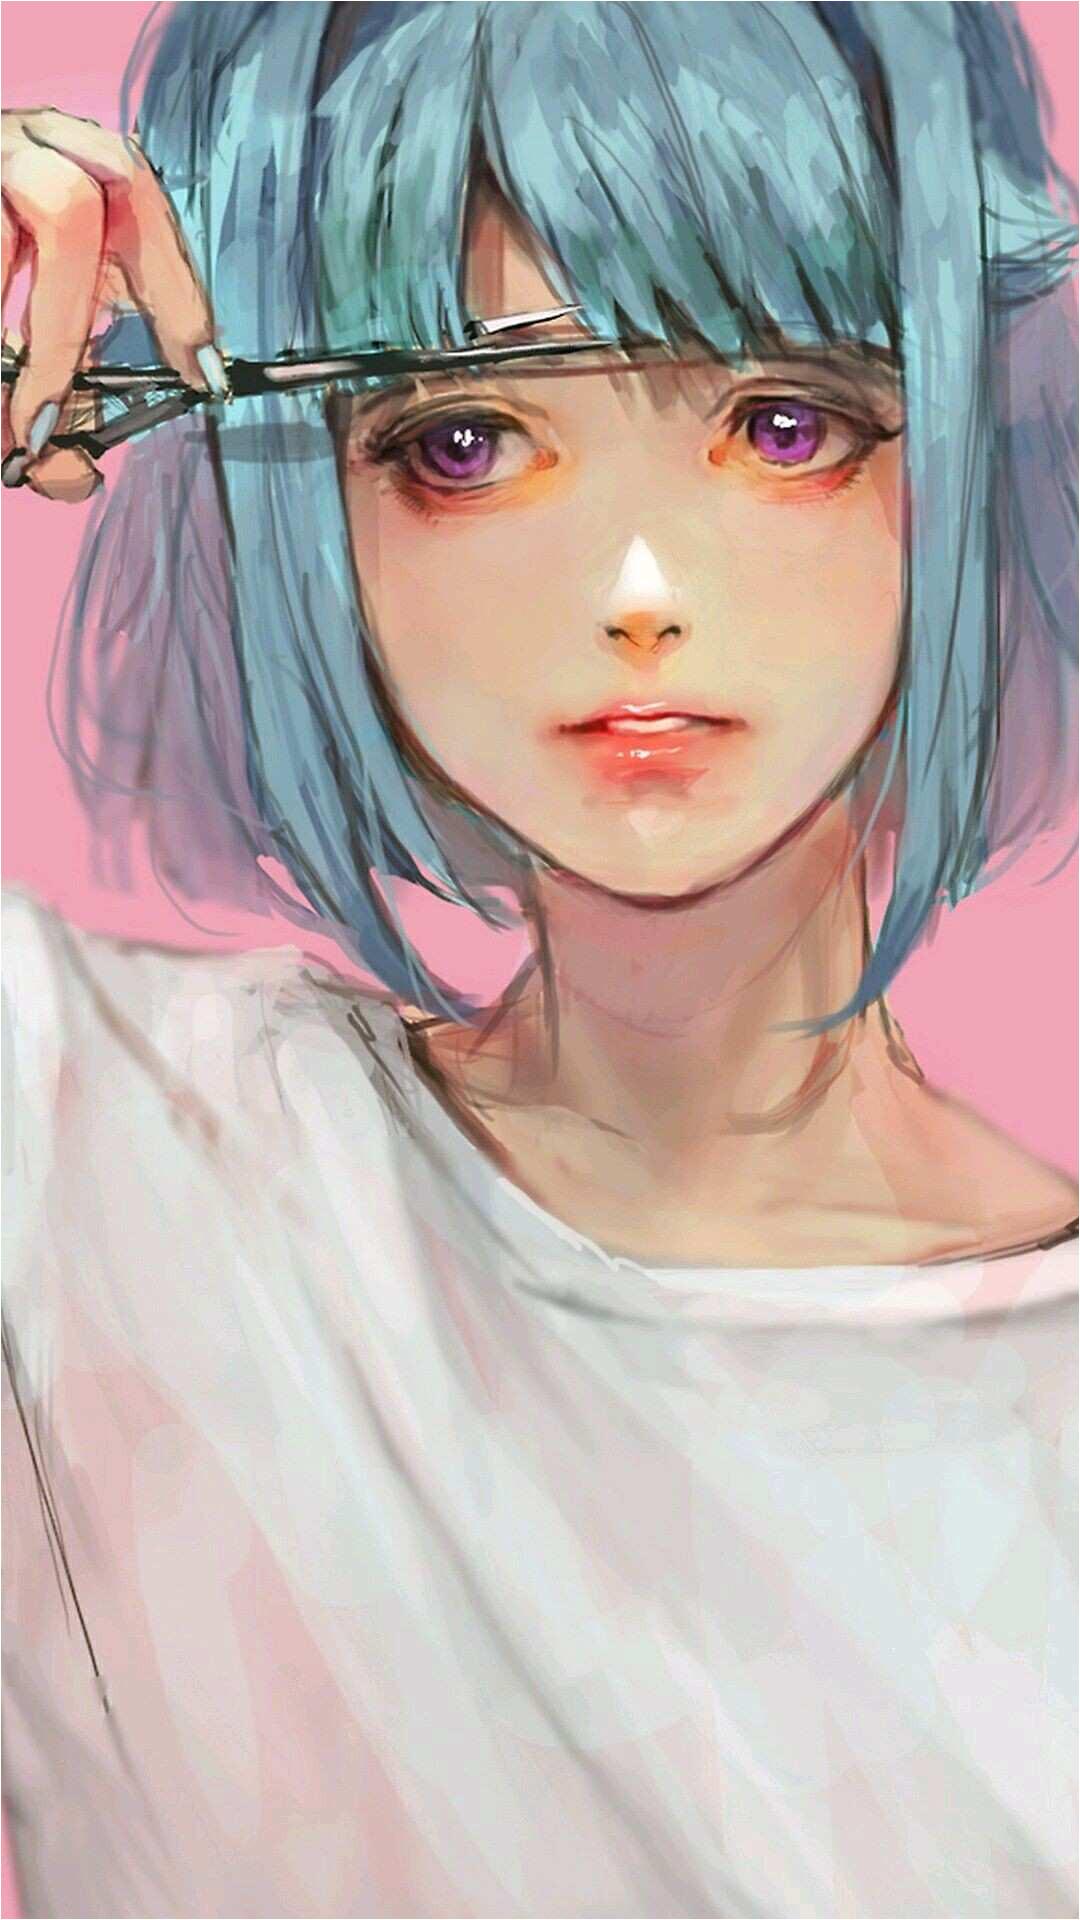 Anime Girl Hairstyle New Pin by Ileana Miranda Anime G I R L S Pinterest Anime Girl Hairstyle